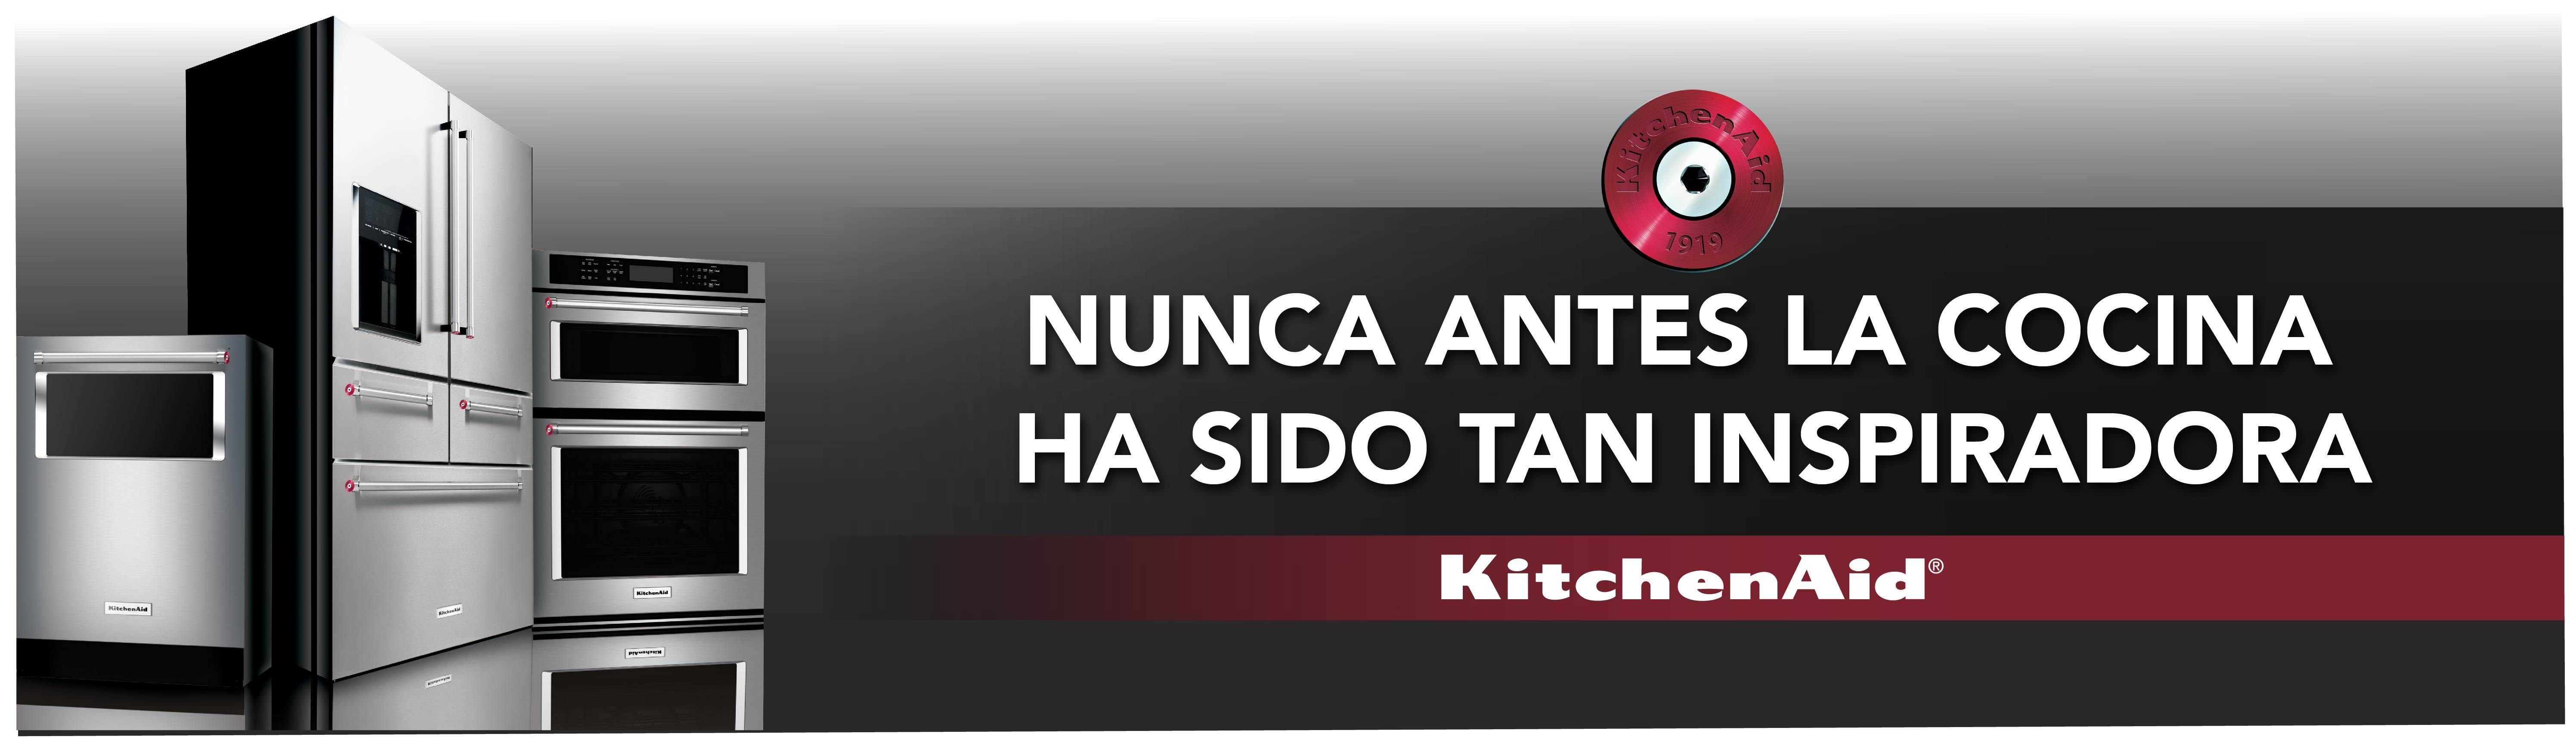 kitchenaid-banner-01.jpg